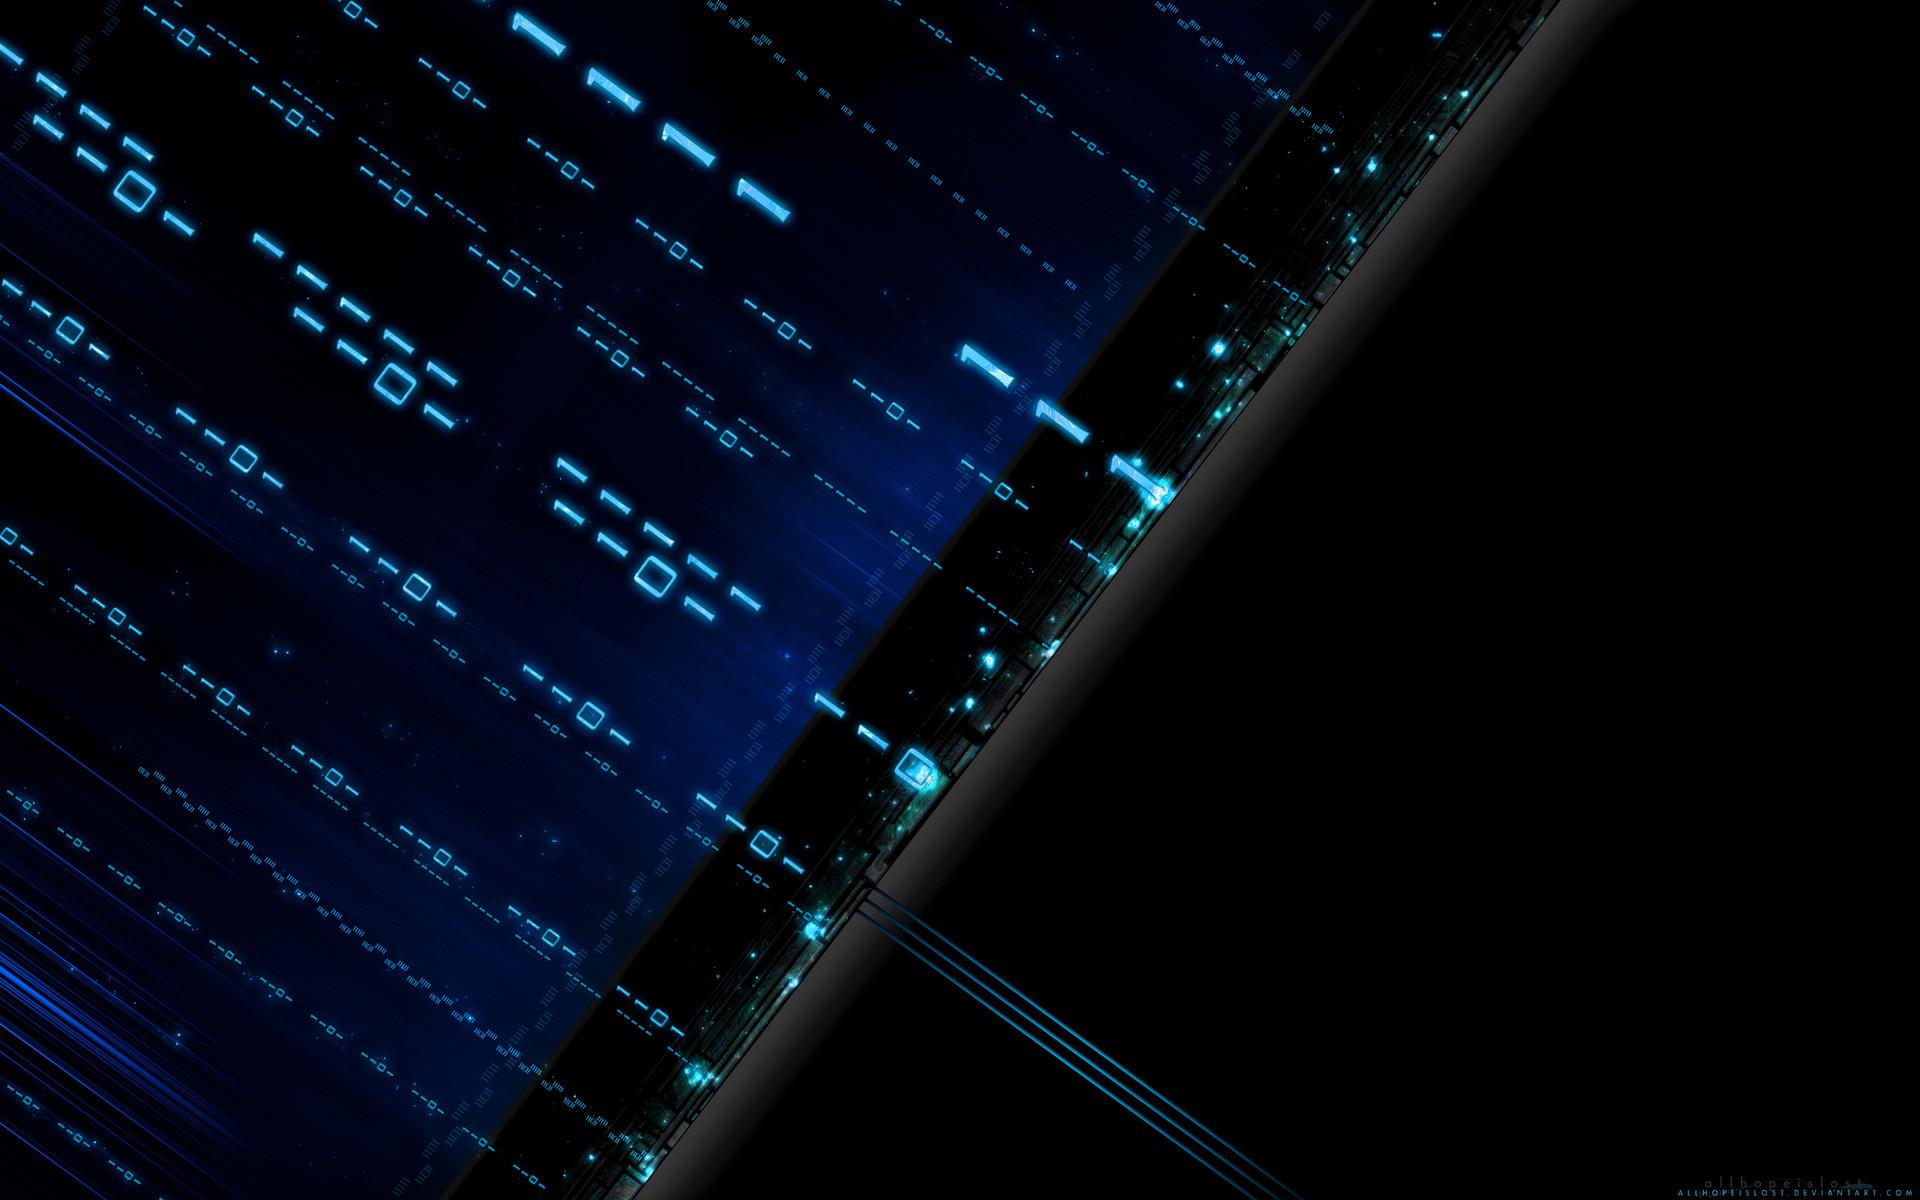 Technology – Binary Technology Wallpaper